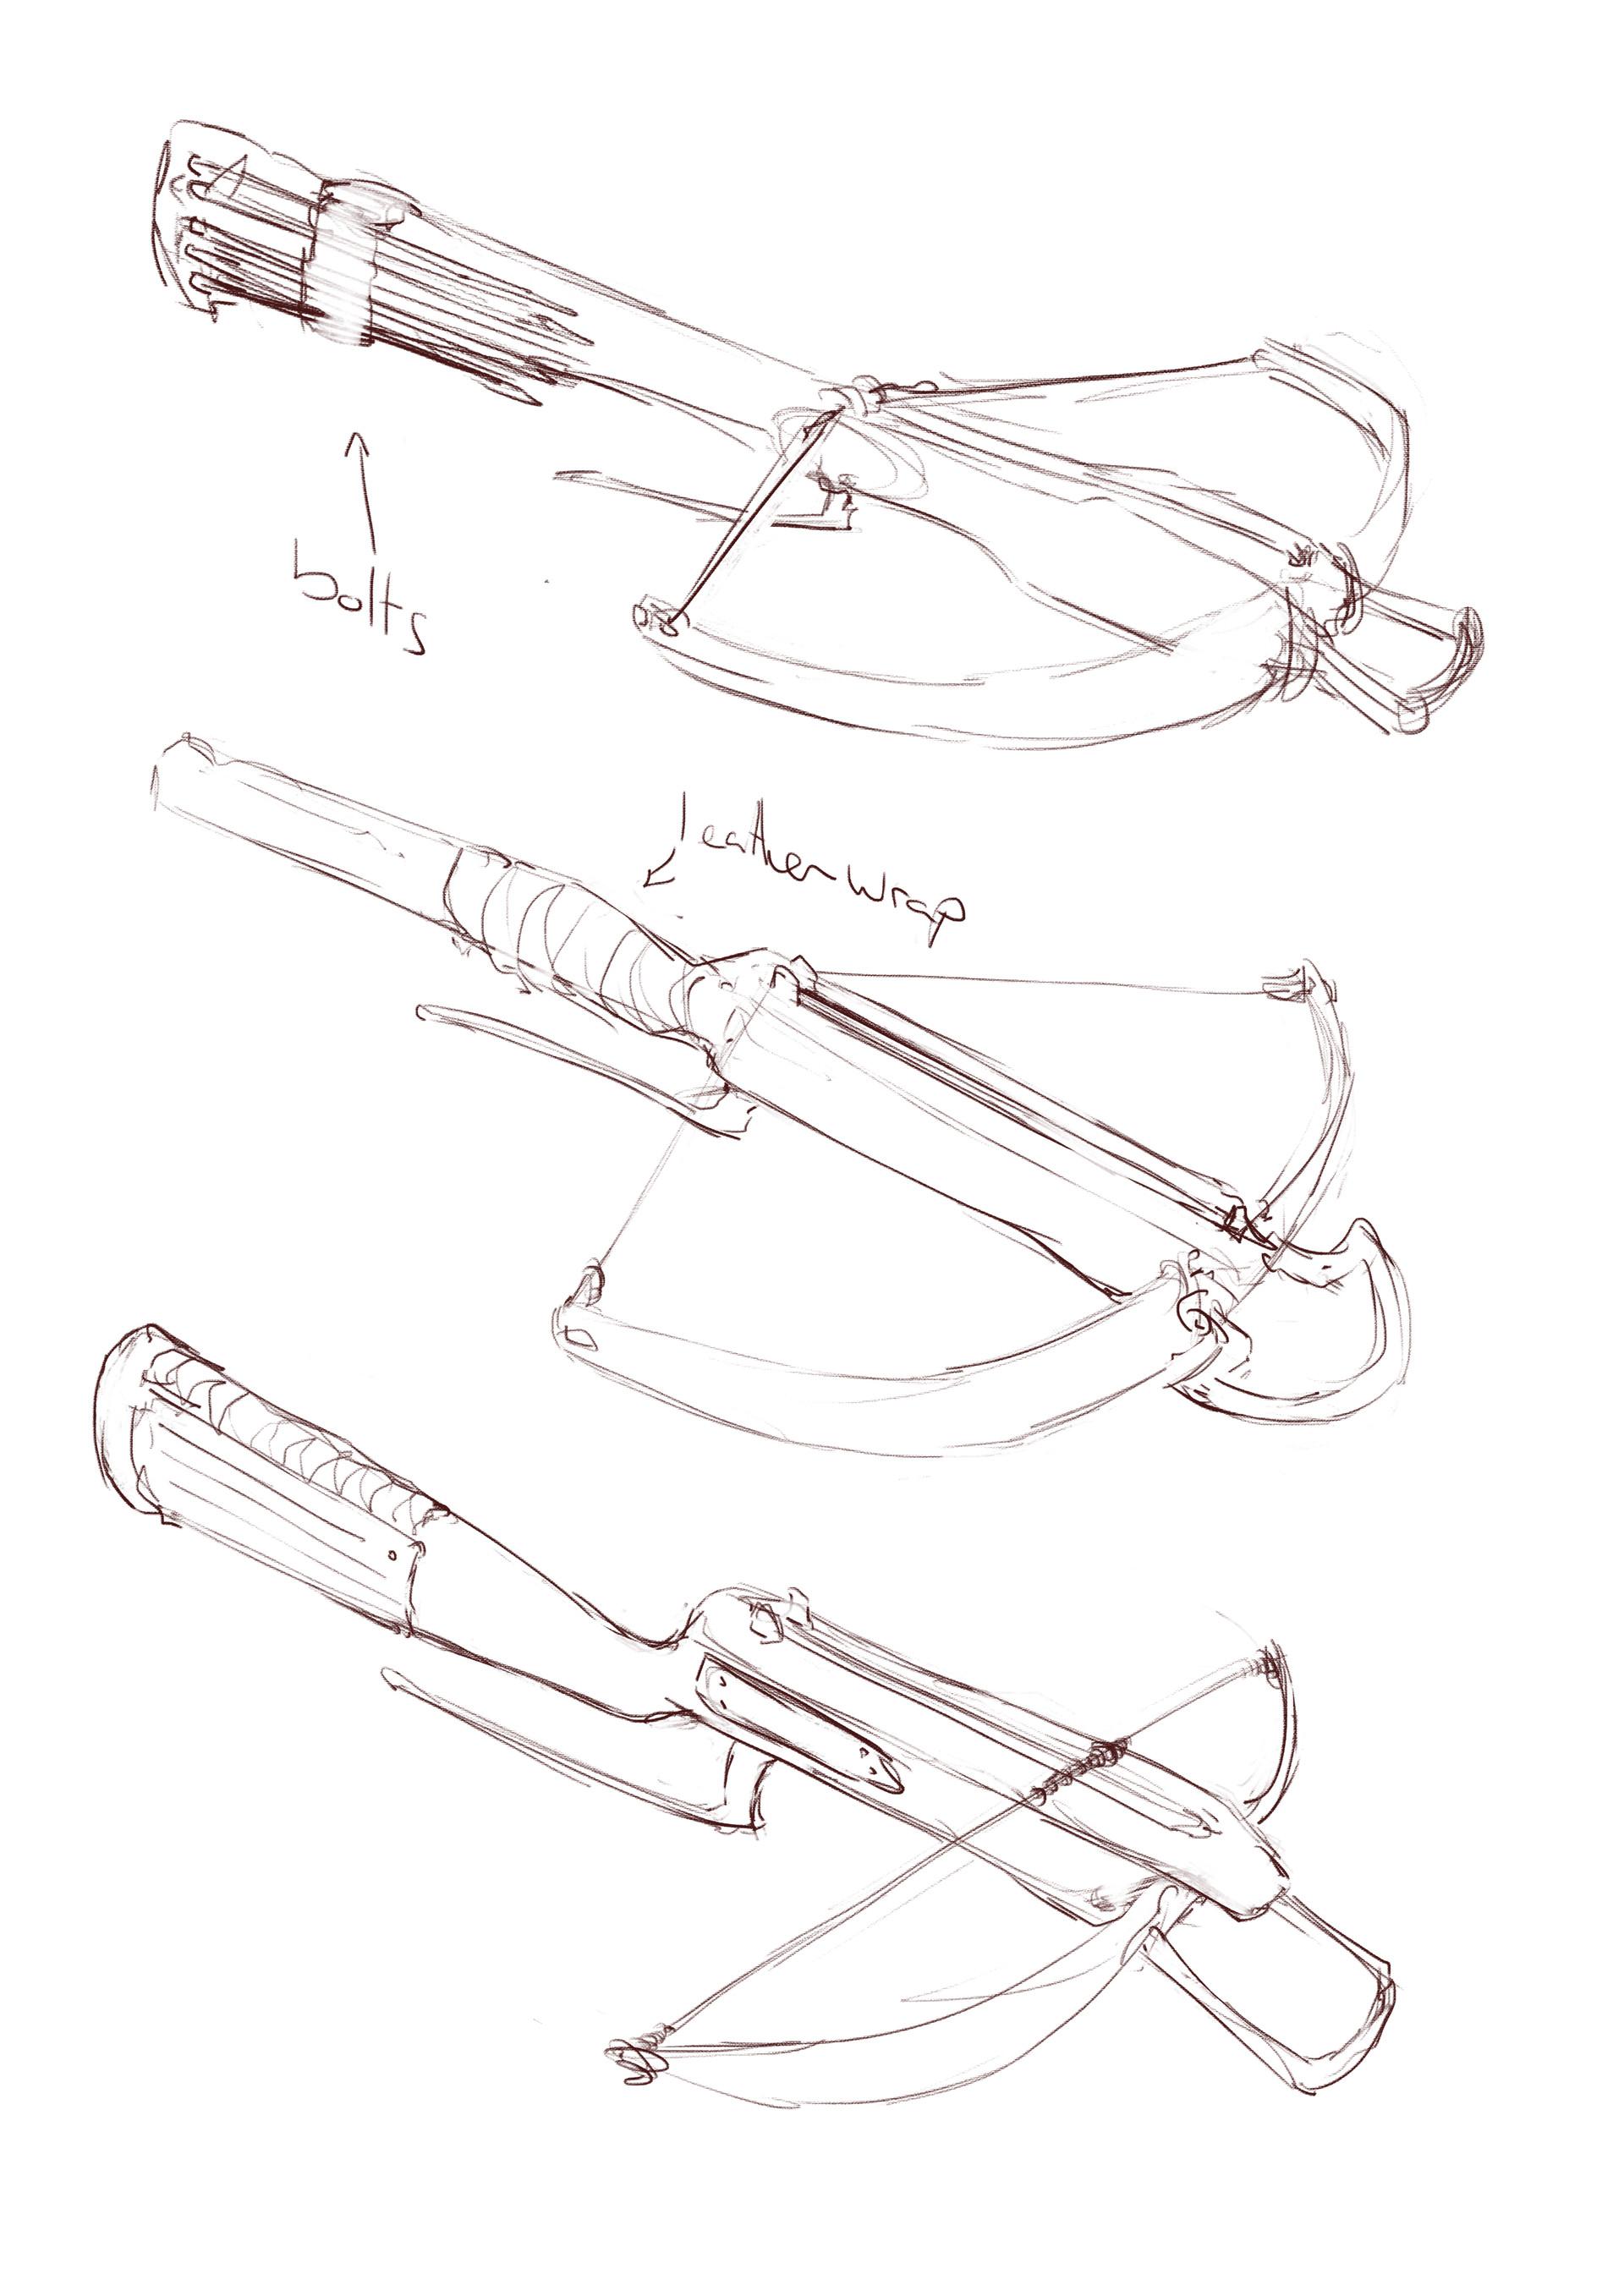 adam barker odin Crossbow Kit adam barker crossbows